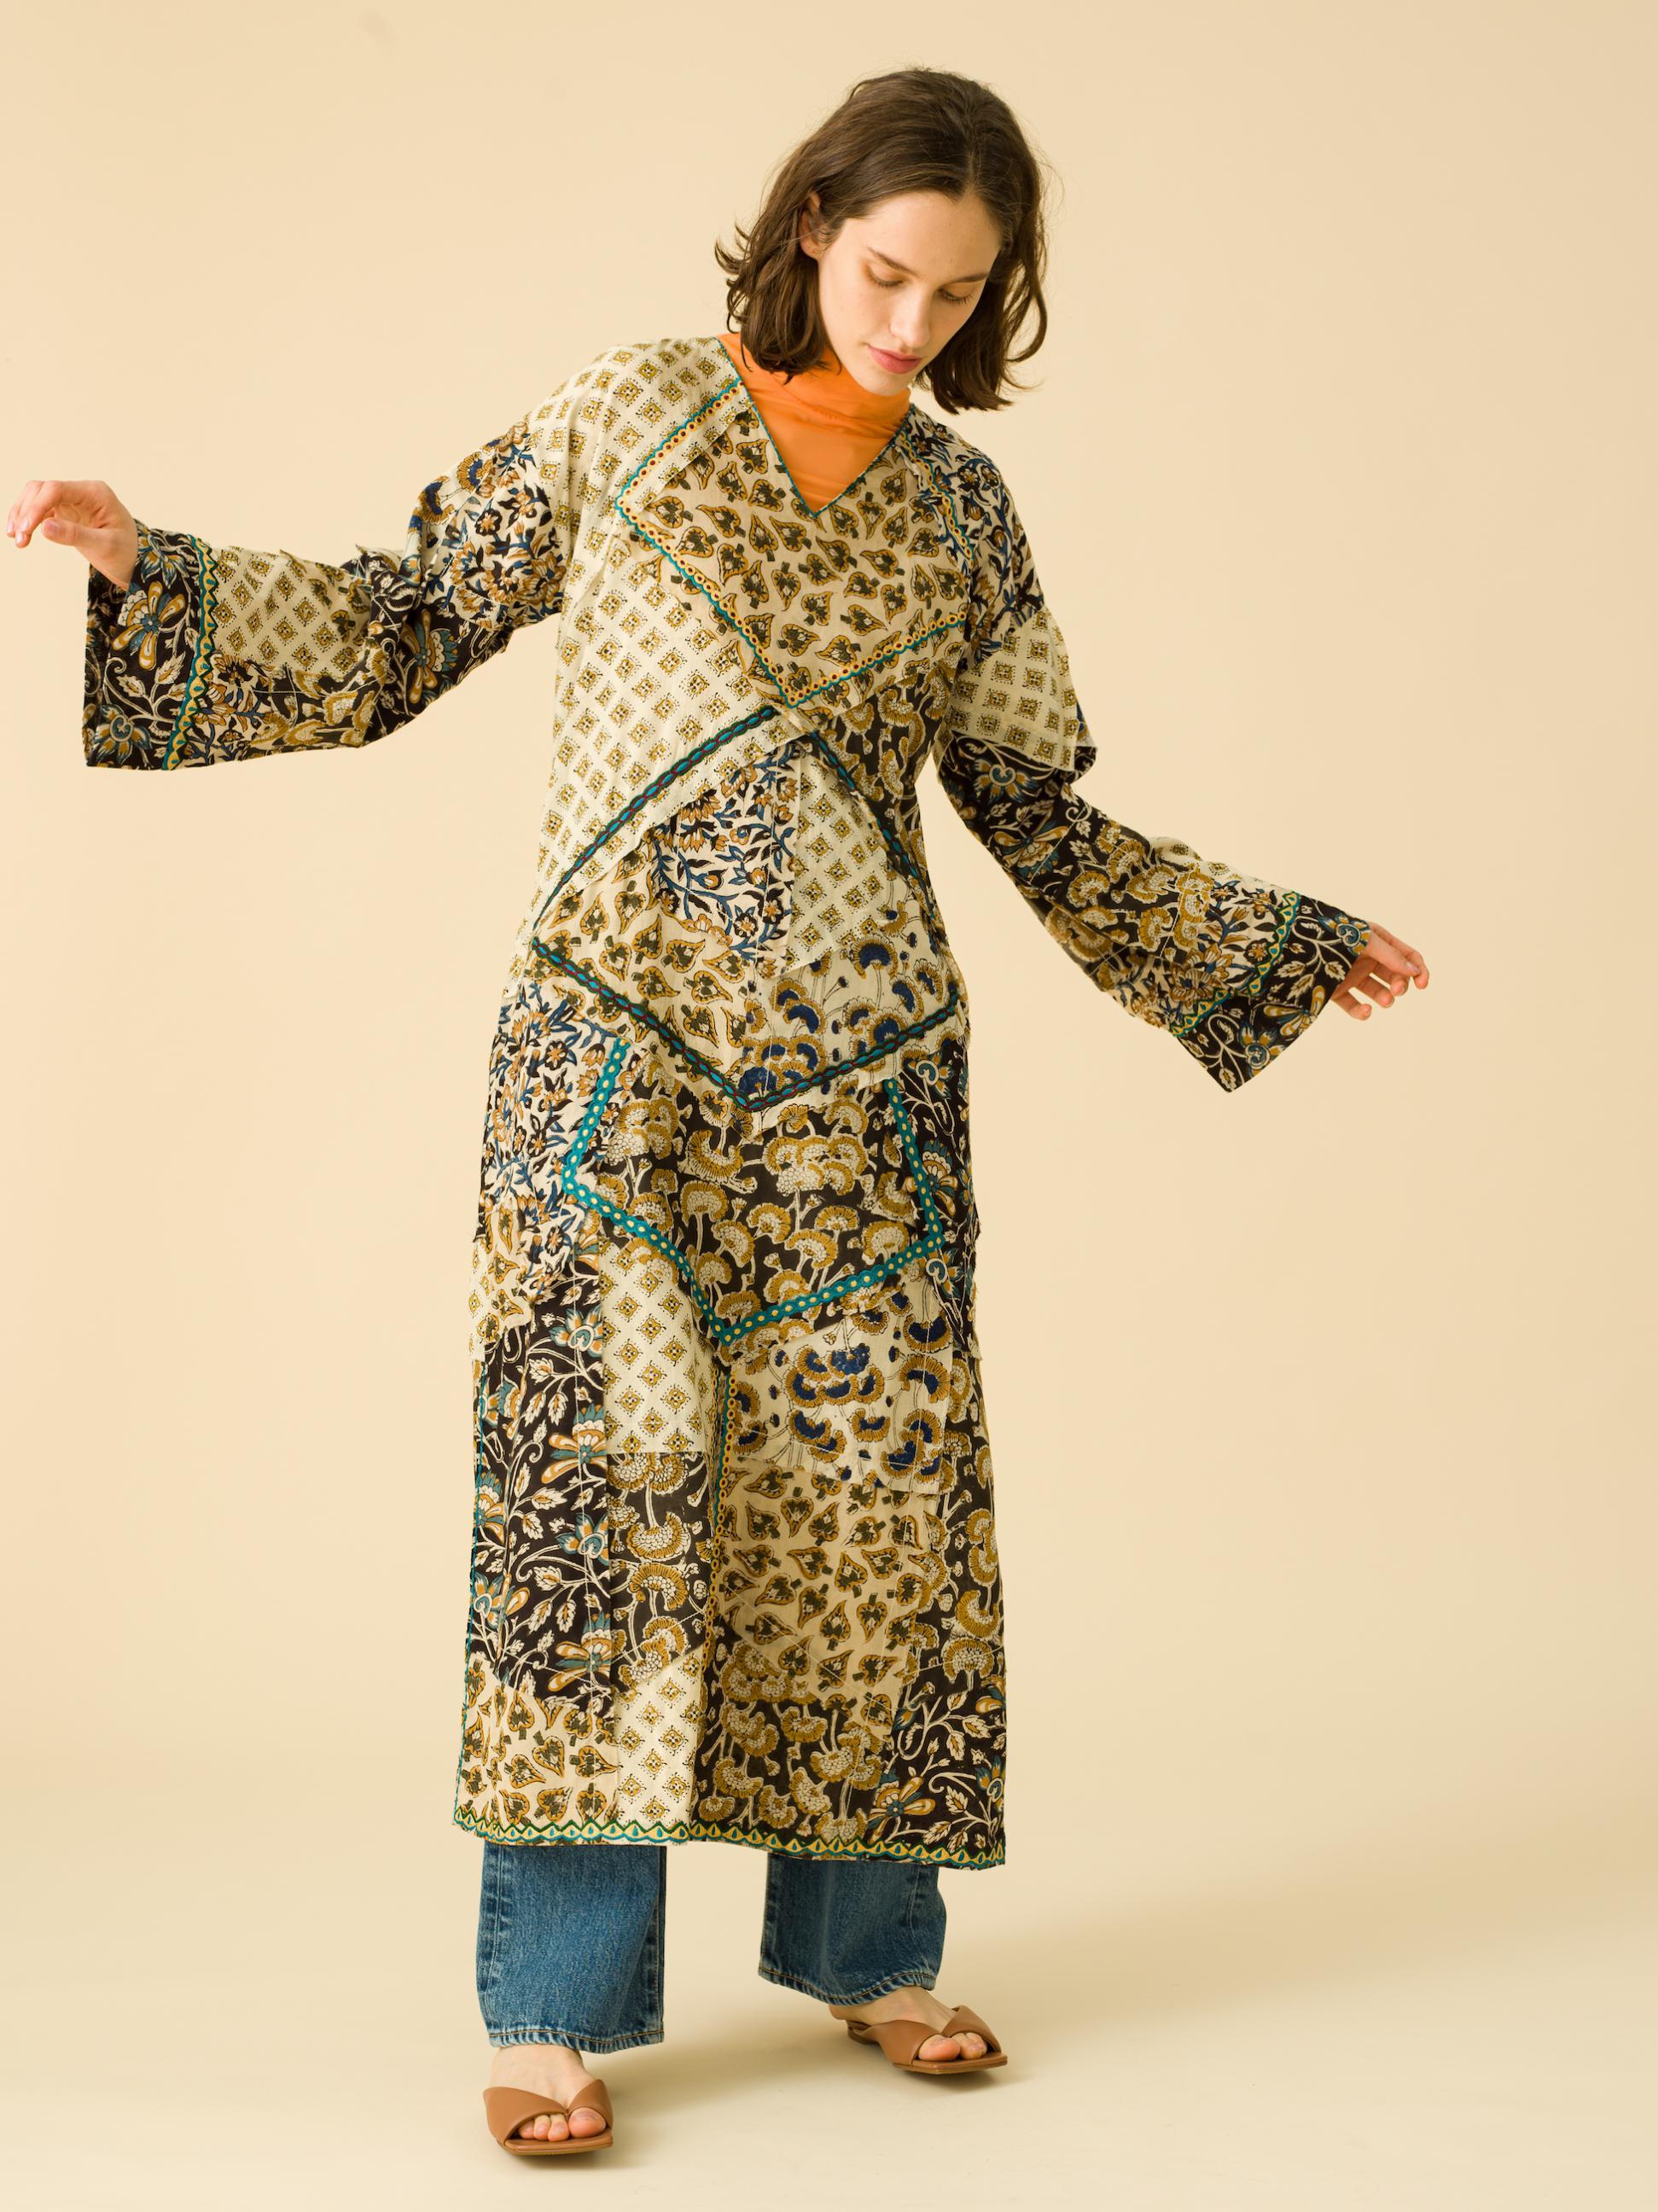 5_2 dress¥19,000 tops¥19,000 pants¥23,000 shoes¥28,000